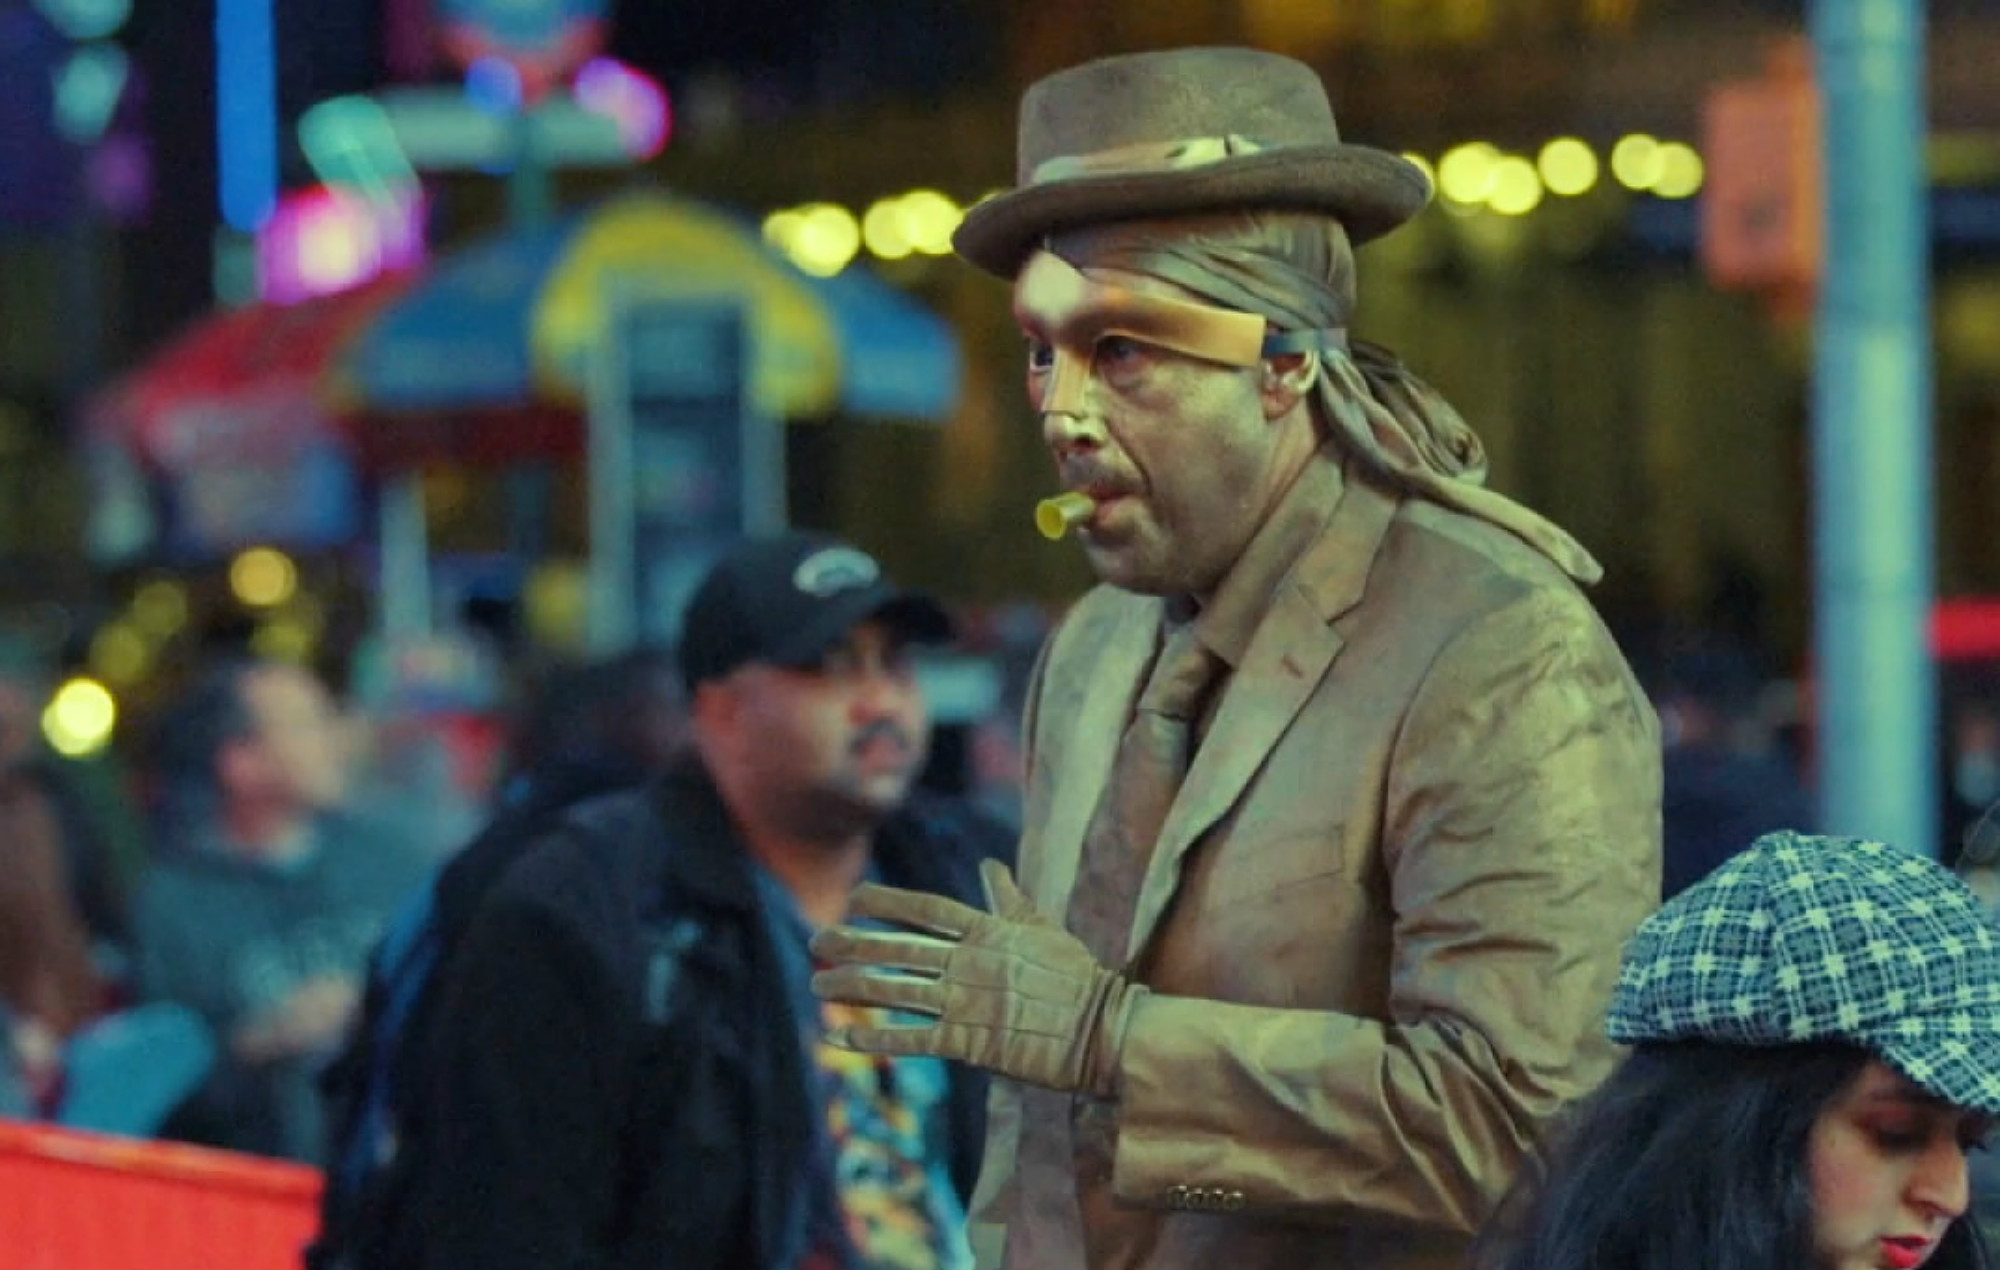 Adam Sandler reunites with 'Uncut Gems' directors for new short film 'Goldman v Silverman'